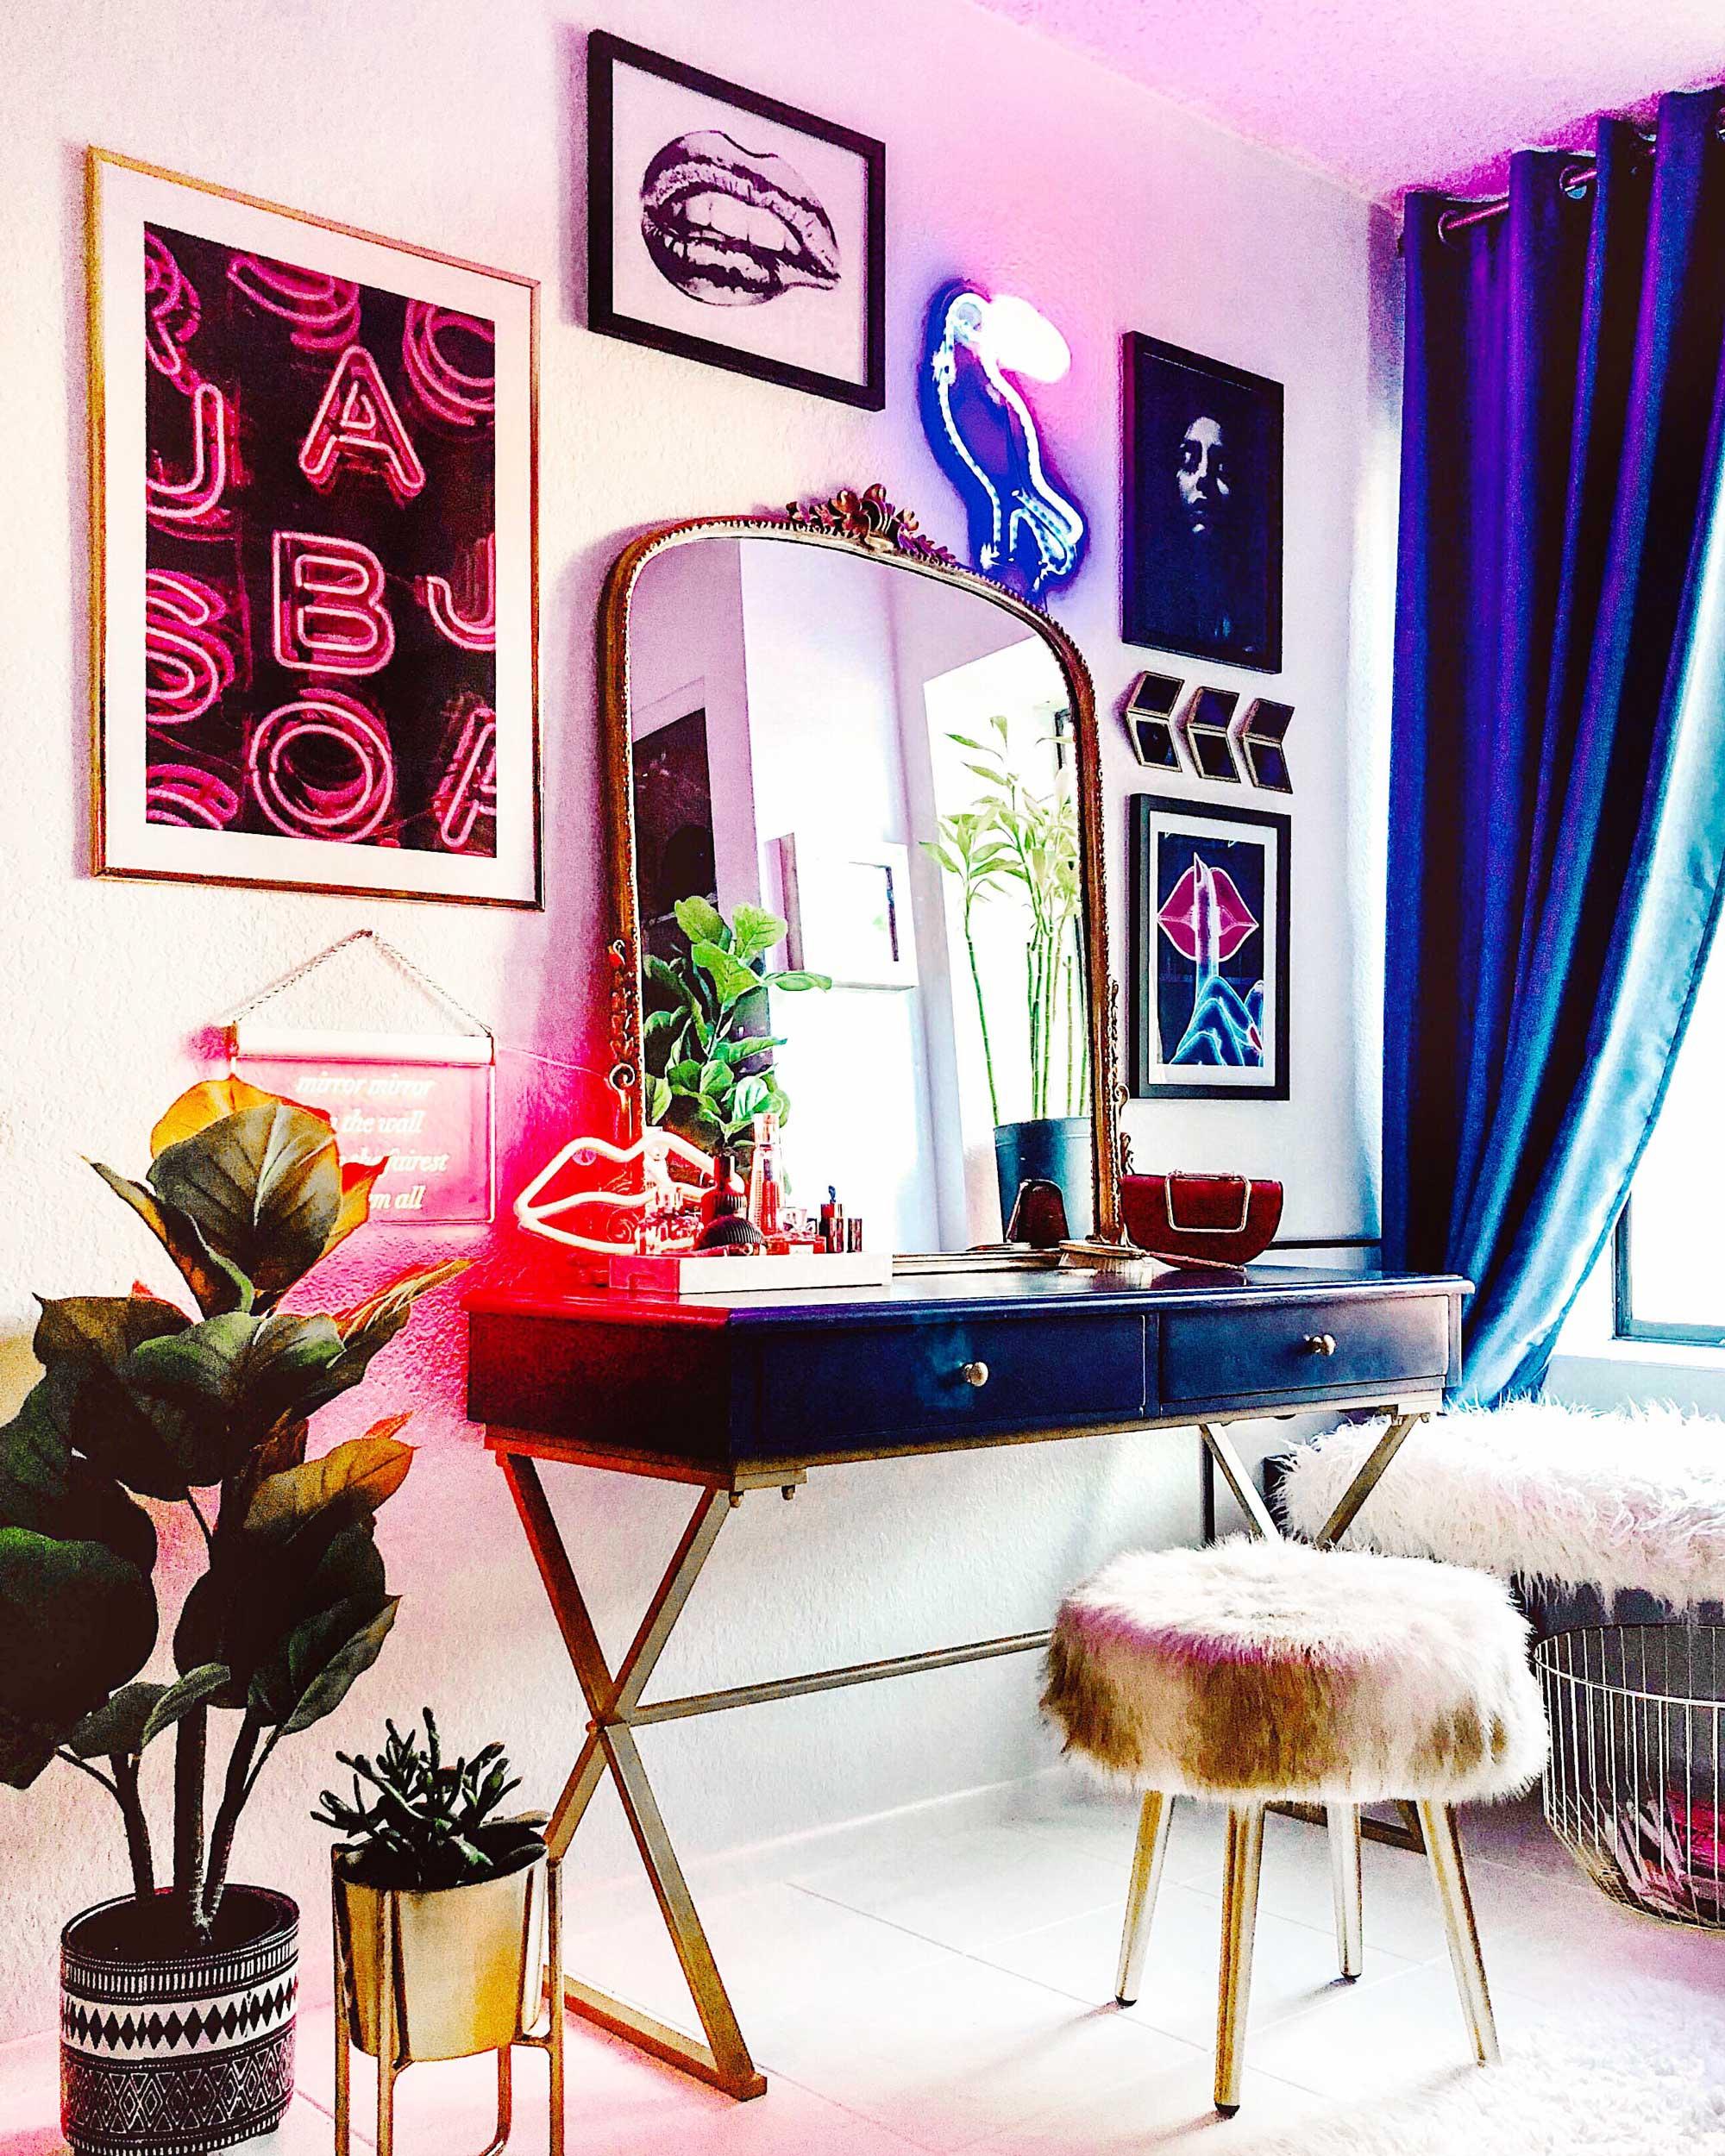 Vanity-room-decoration-idea-Modern Eclectic Vanity with Desenio | Free Phone and Desktop wallpapers download